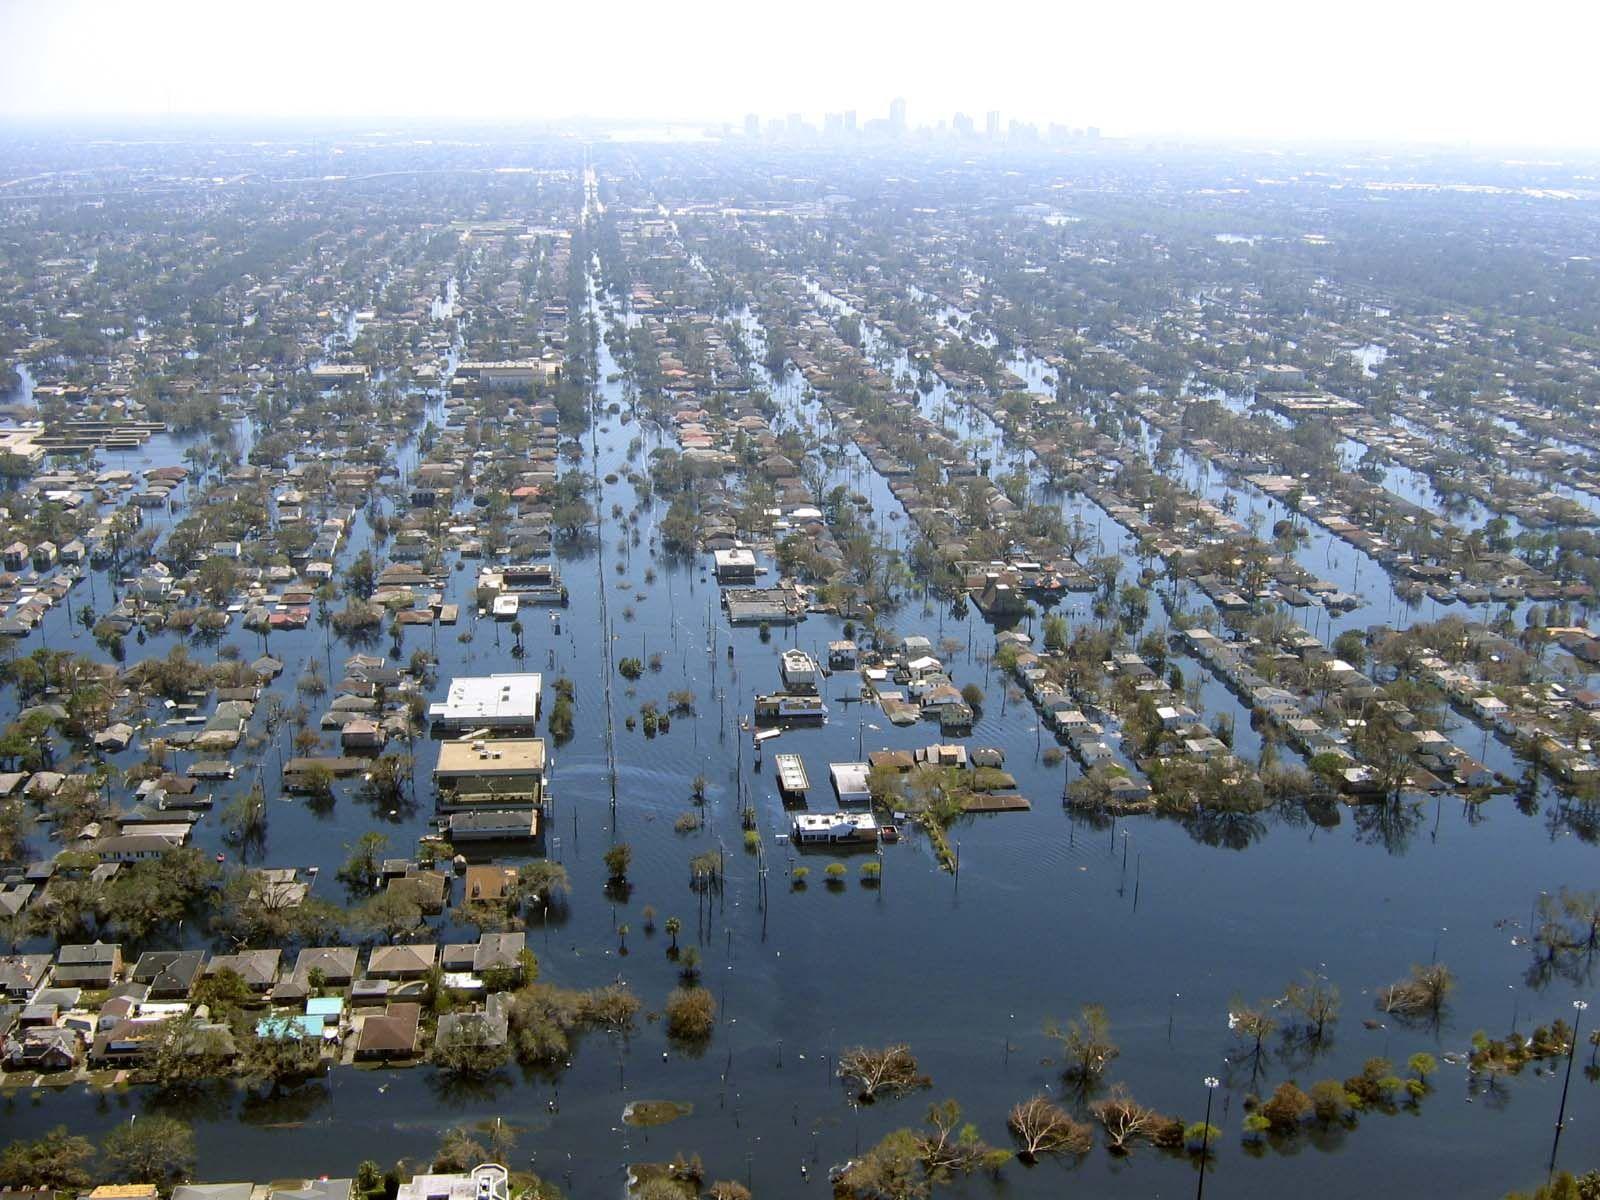 Case Study Hurricane Katrina And Post Disaster Social Learning Natural Disasters Hurricane Katrina New Orleans